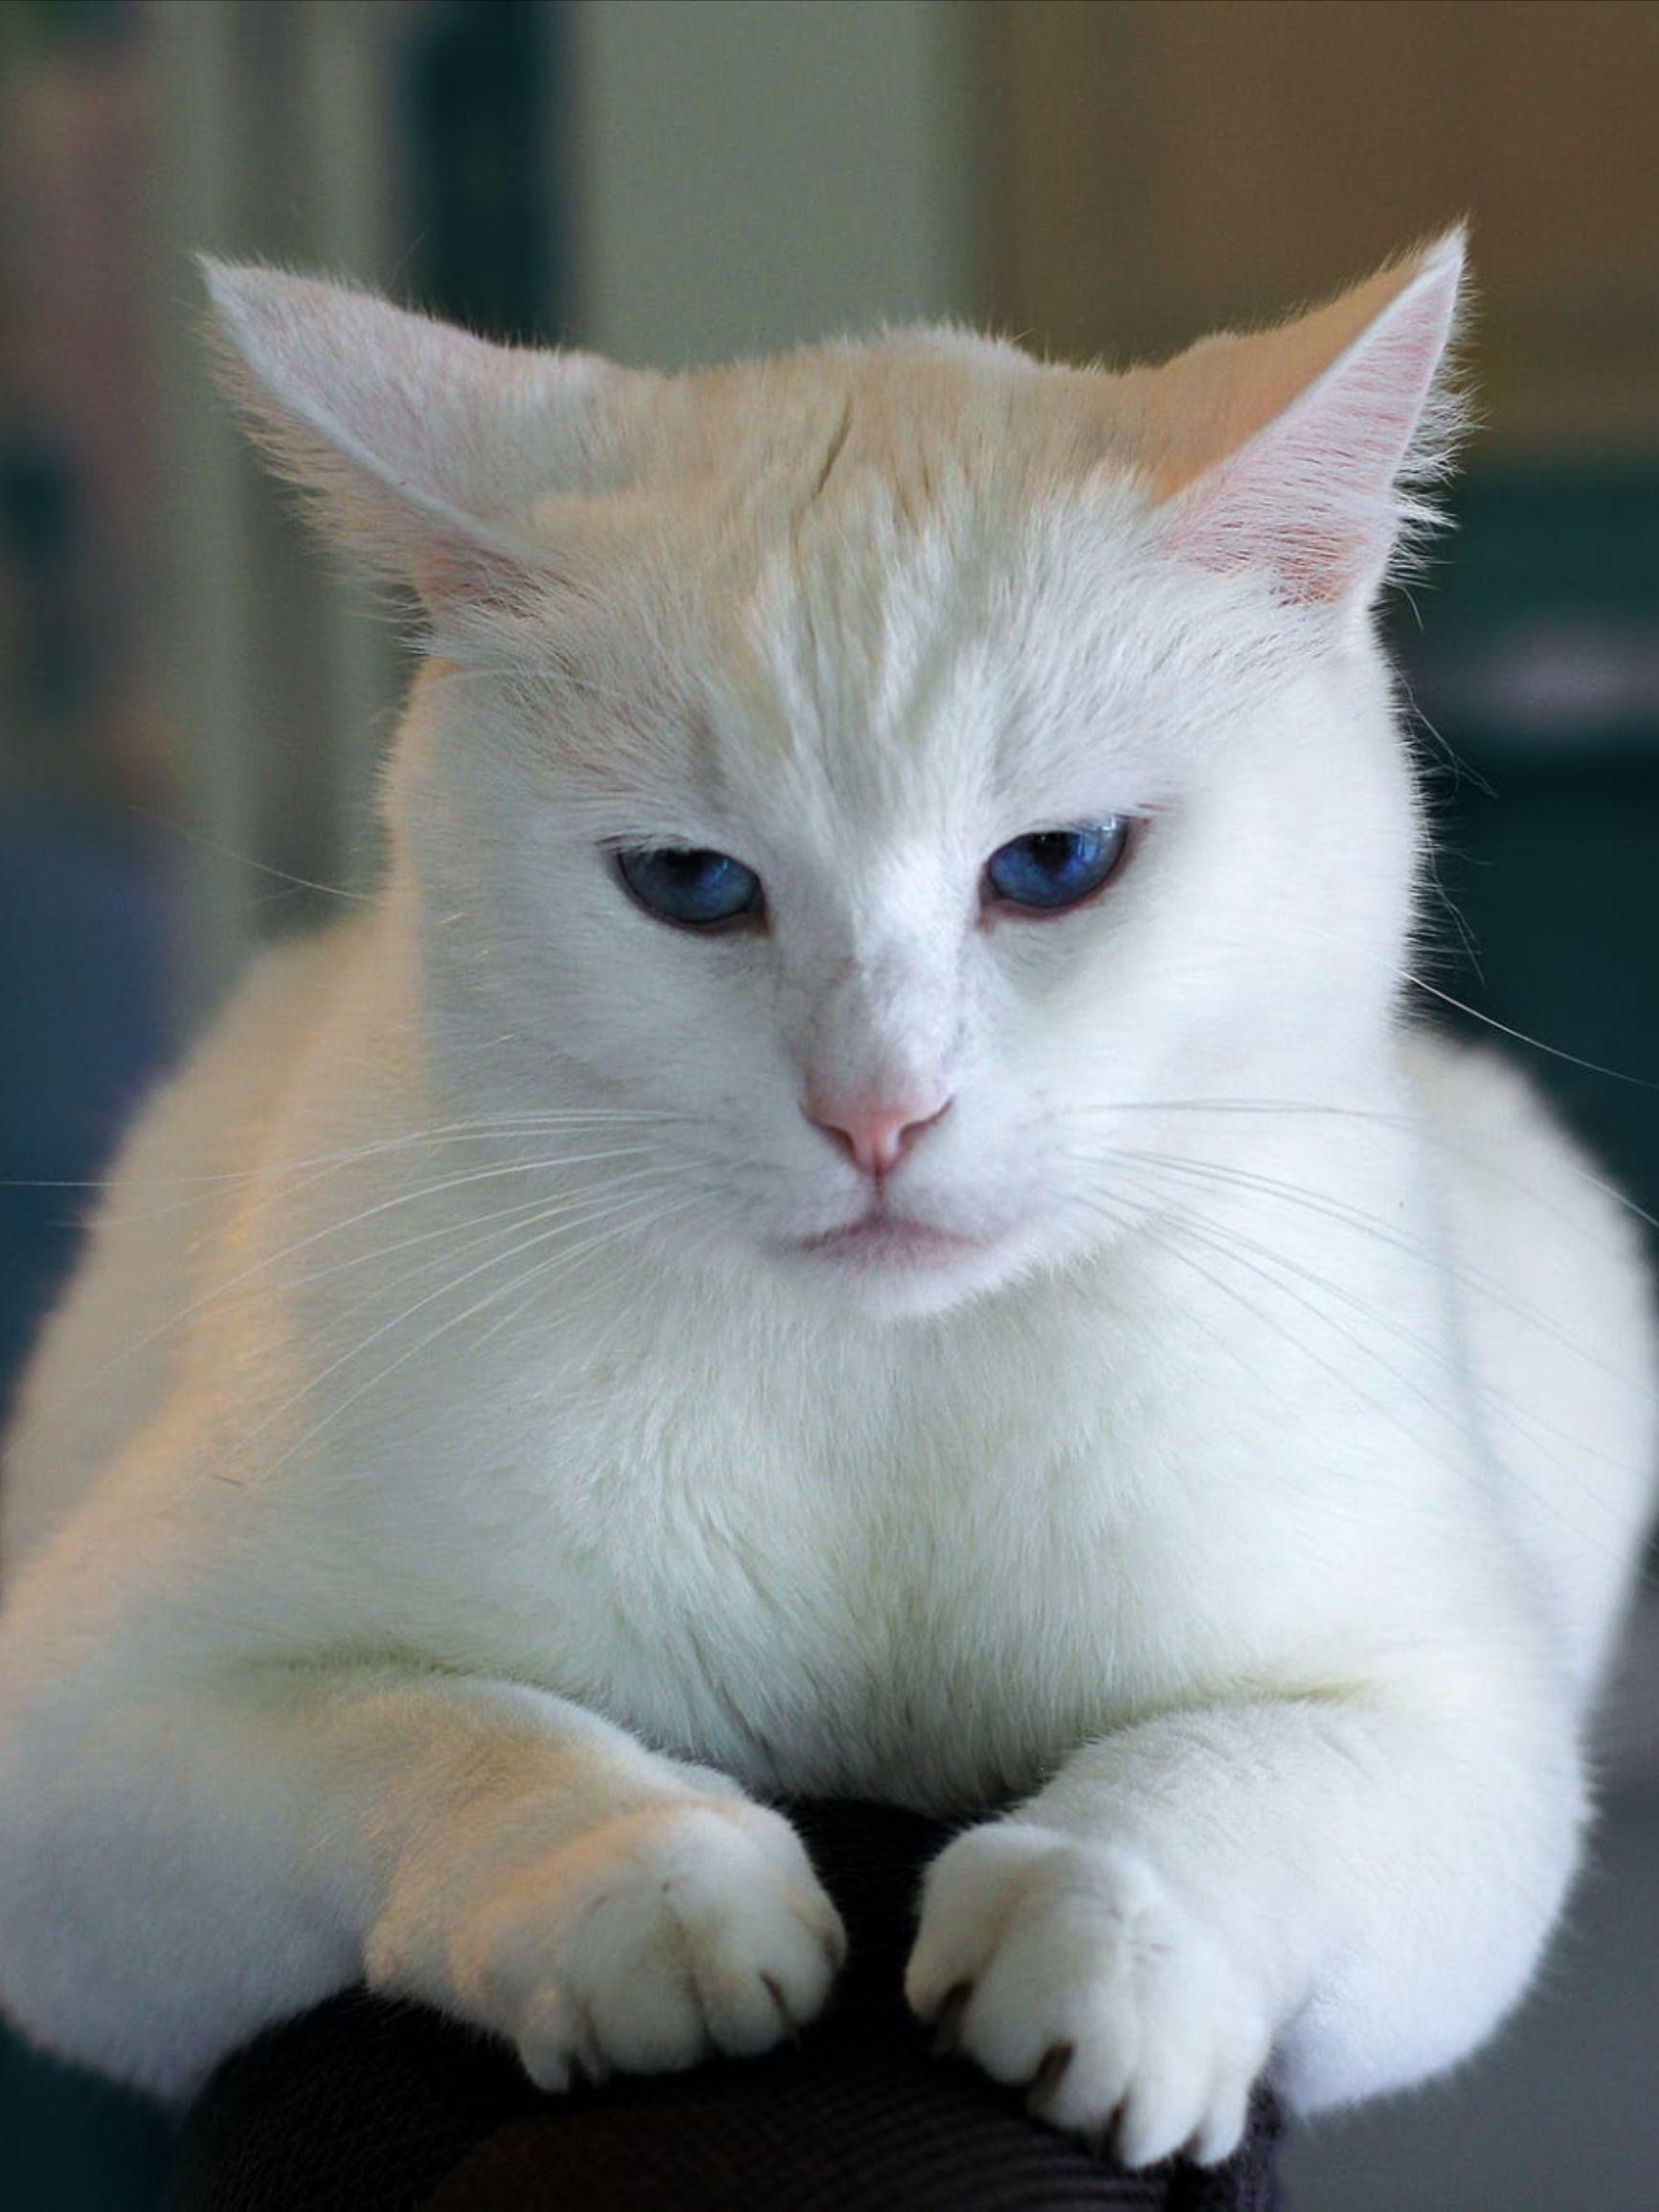 Simply Beautiful White Cat in 2020 Cat care, Cat having